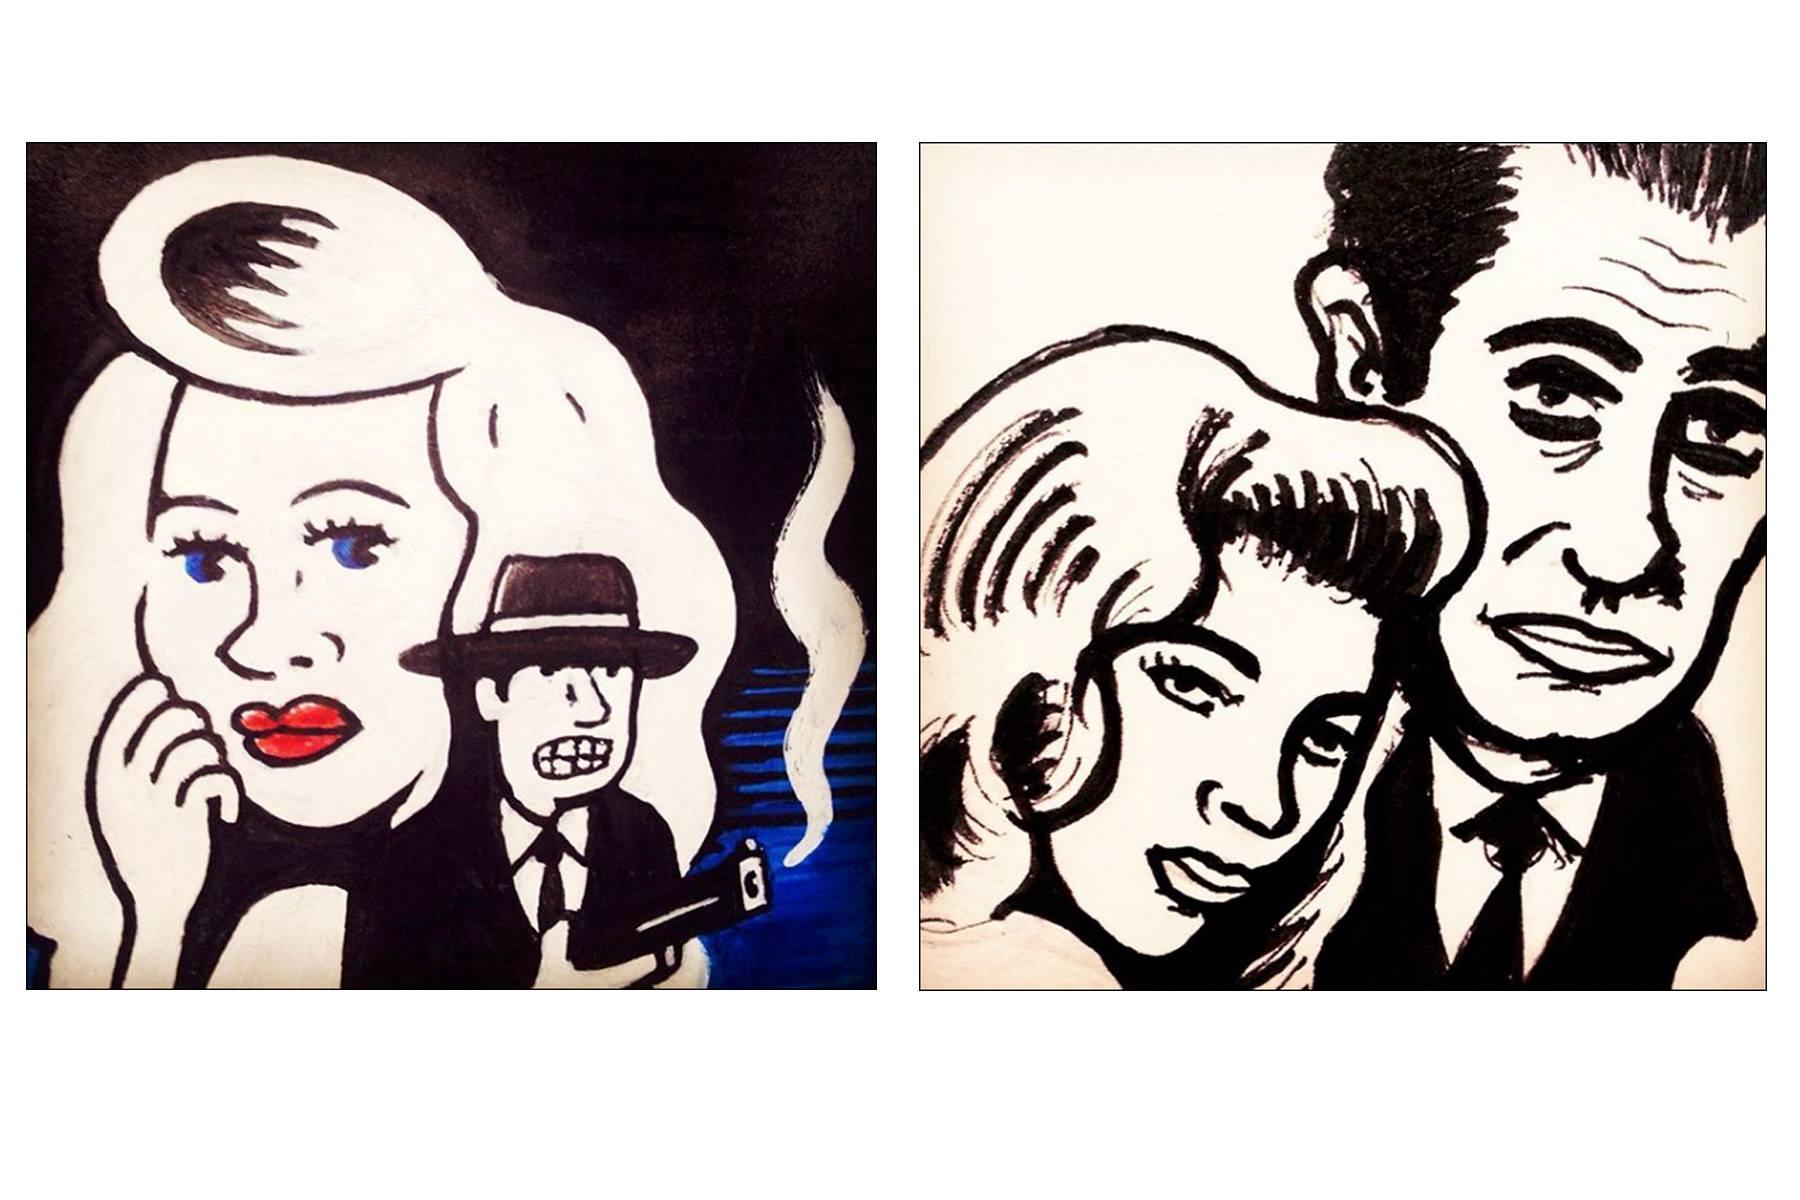 Humphrey Bogart & Lauren Bacall by Avi Spivak. Ponyboy magazine.